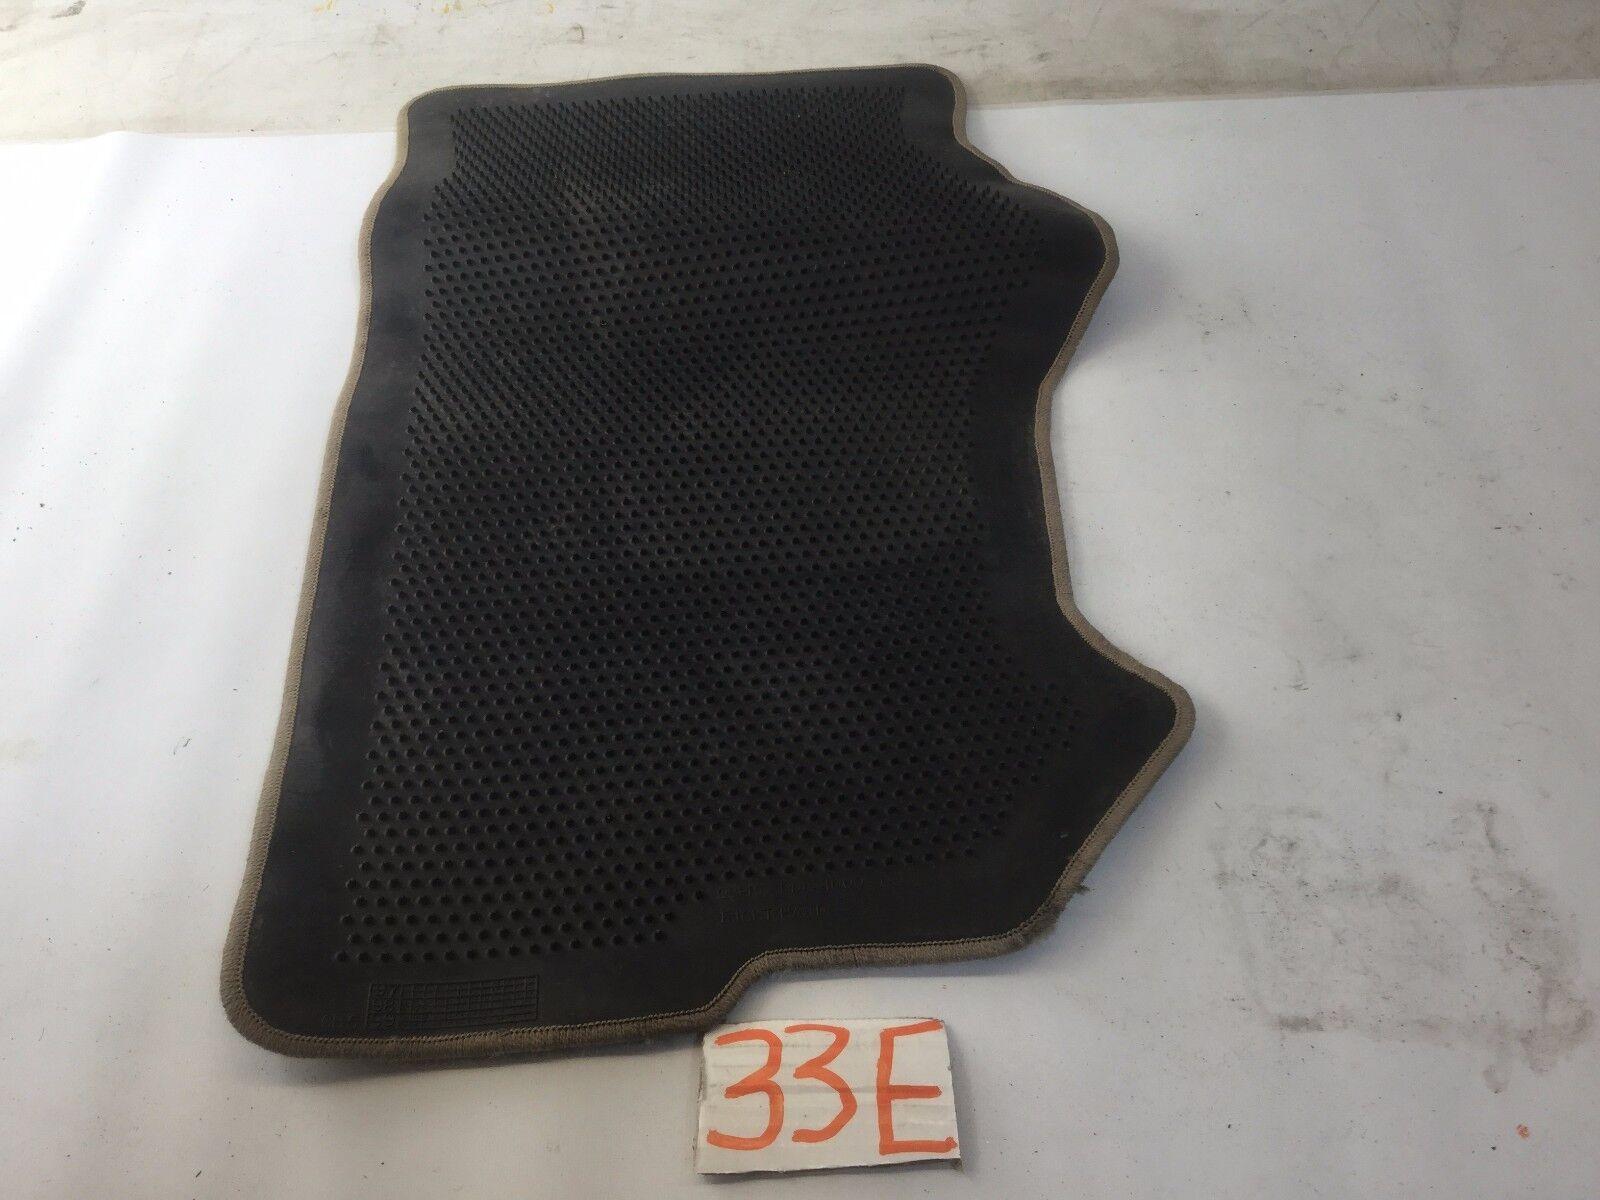 honda suv fit mats for duty row truck bestfh shop heavy auto car tactial rakuten black minivan floor product